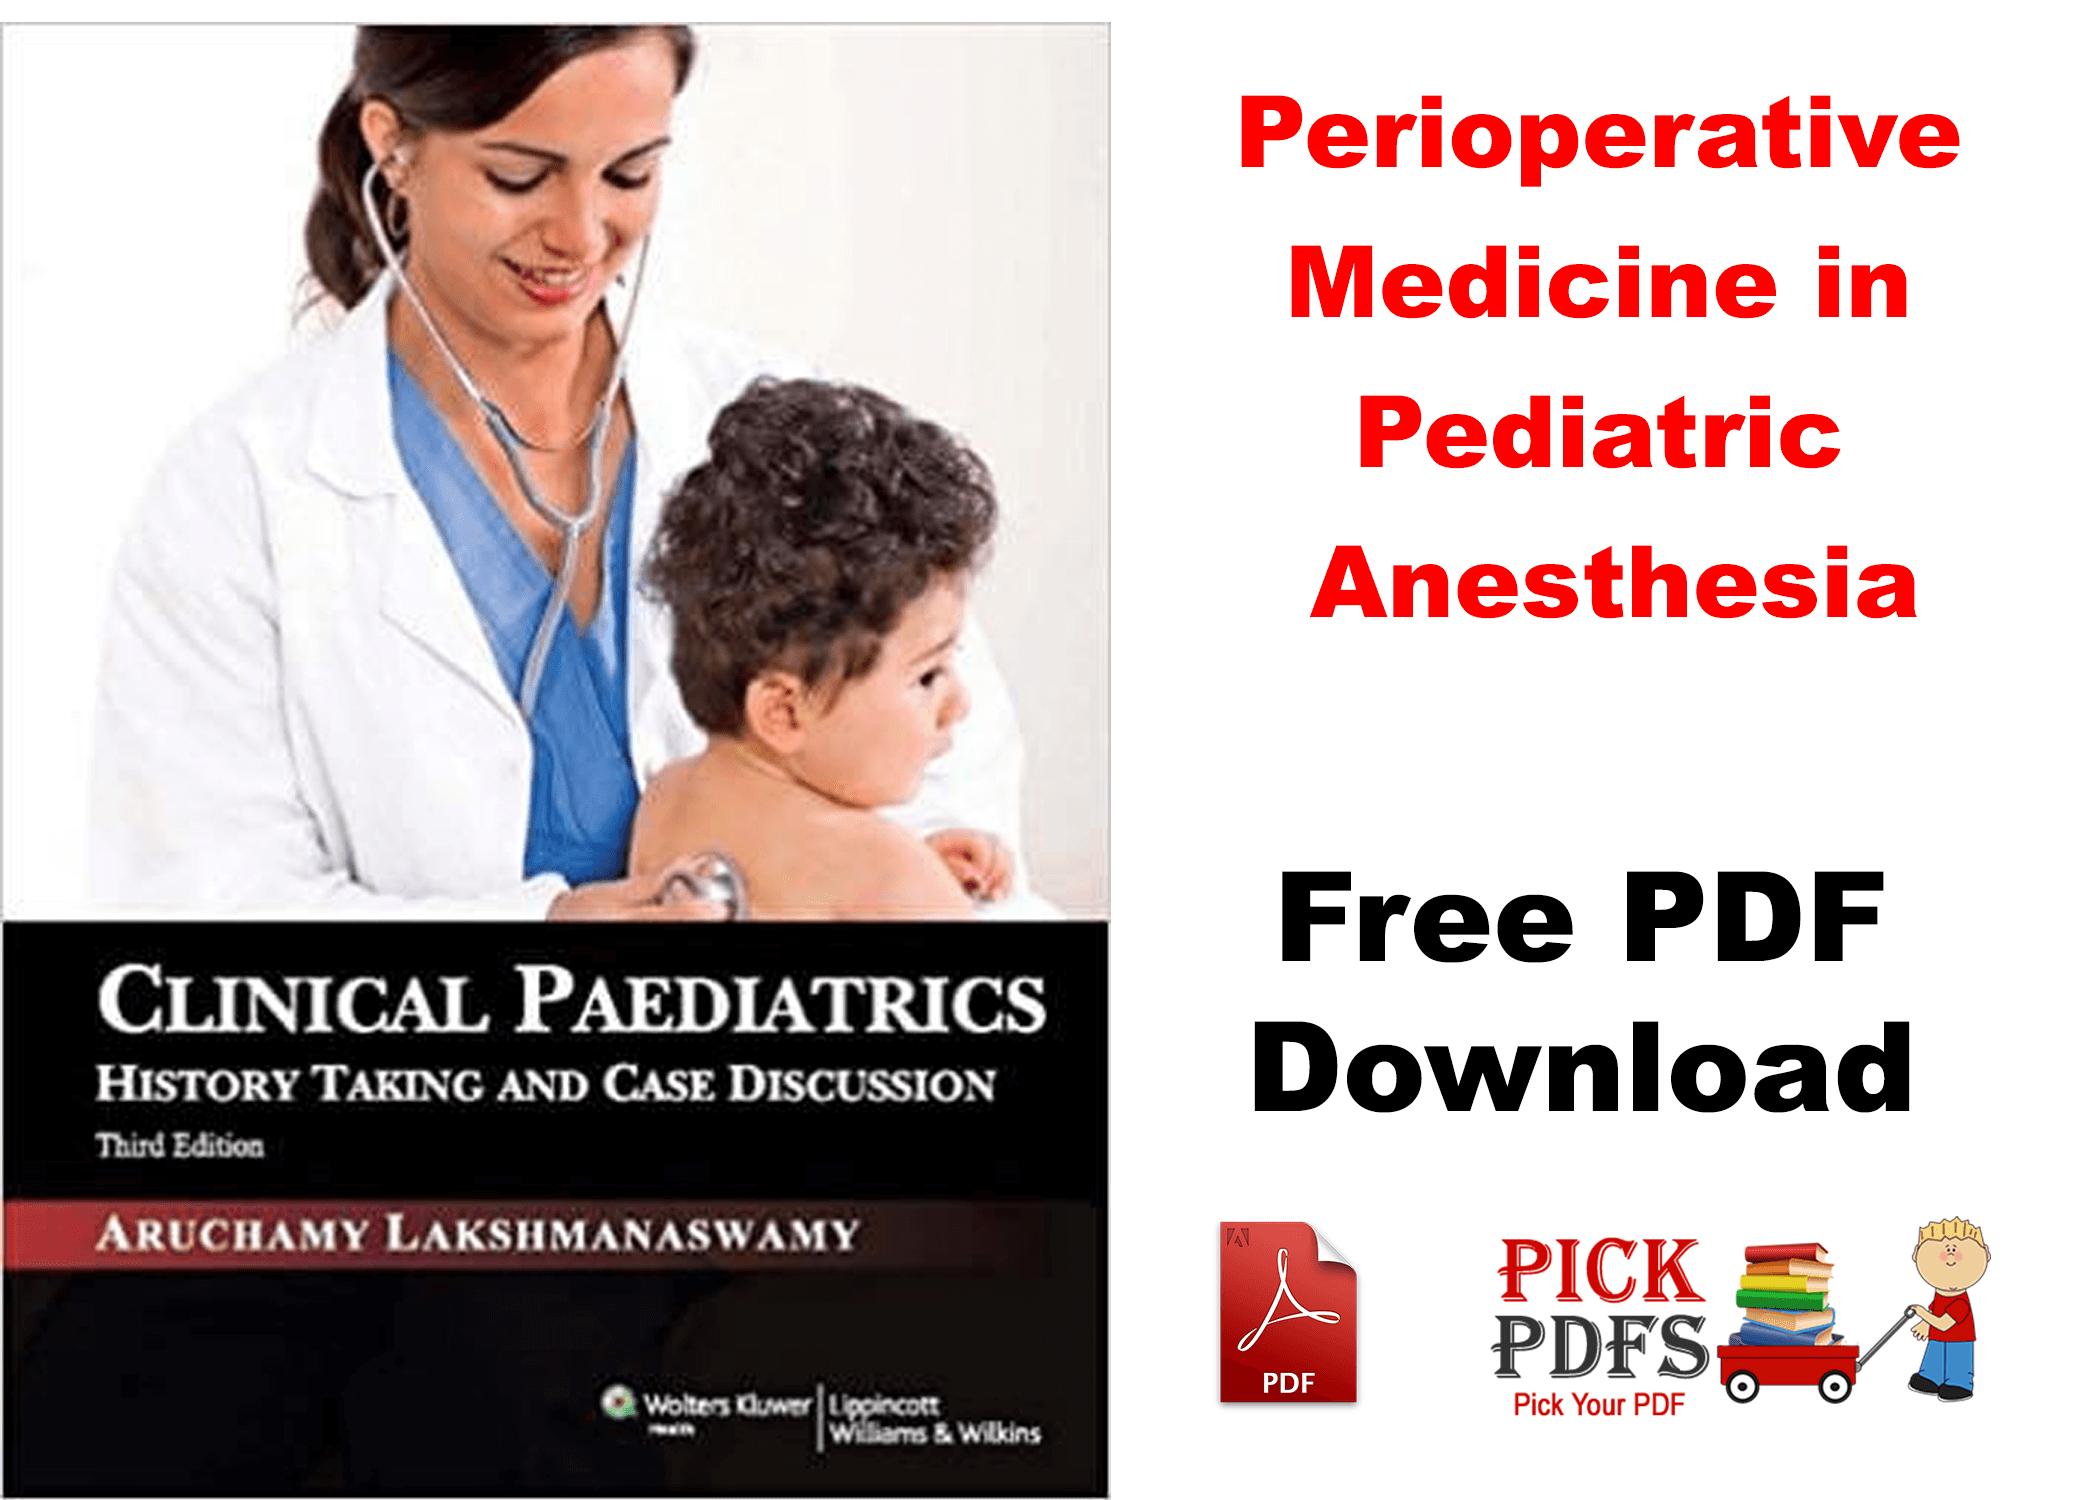 https://pickpdfs.com/perioperative-medicine-in-pediatric-anesthesia/